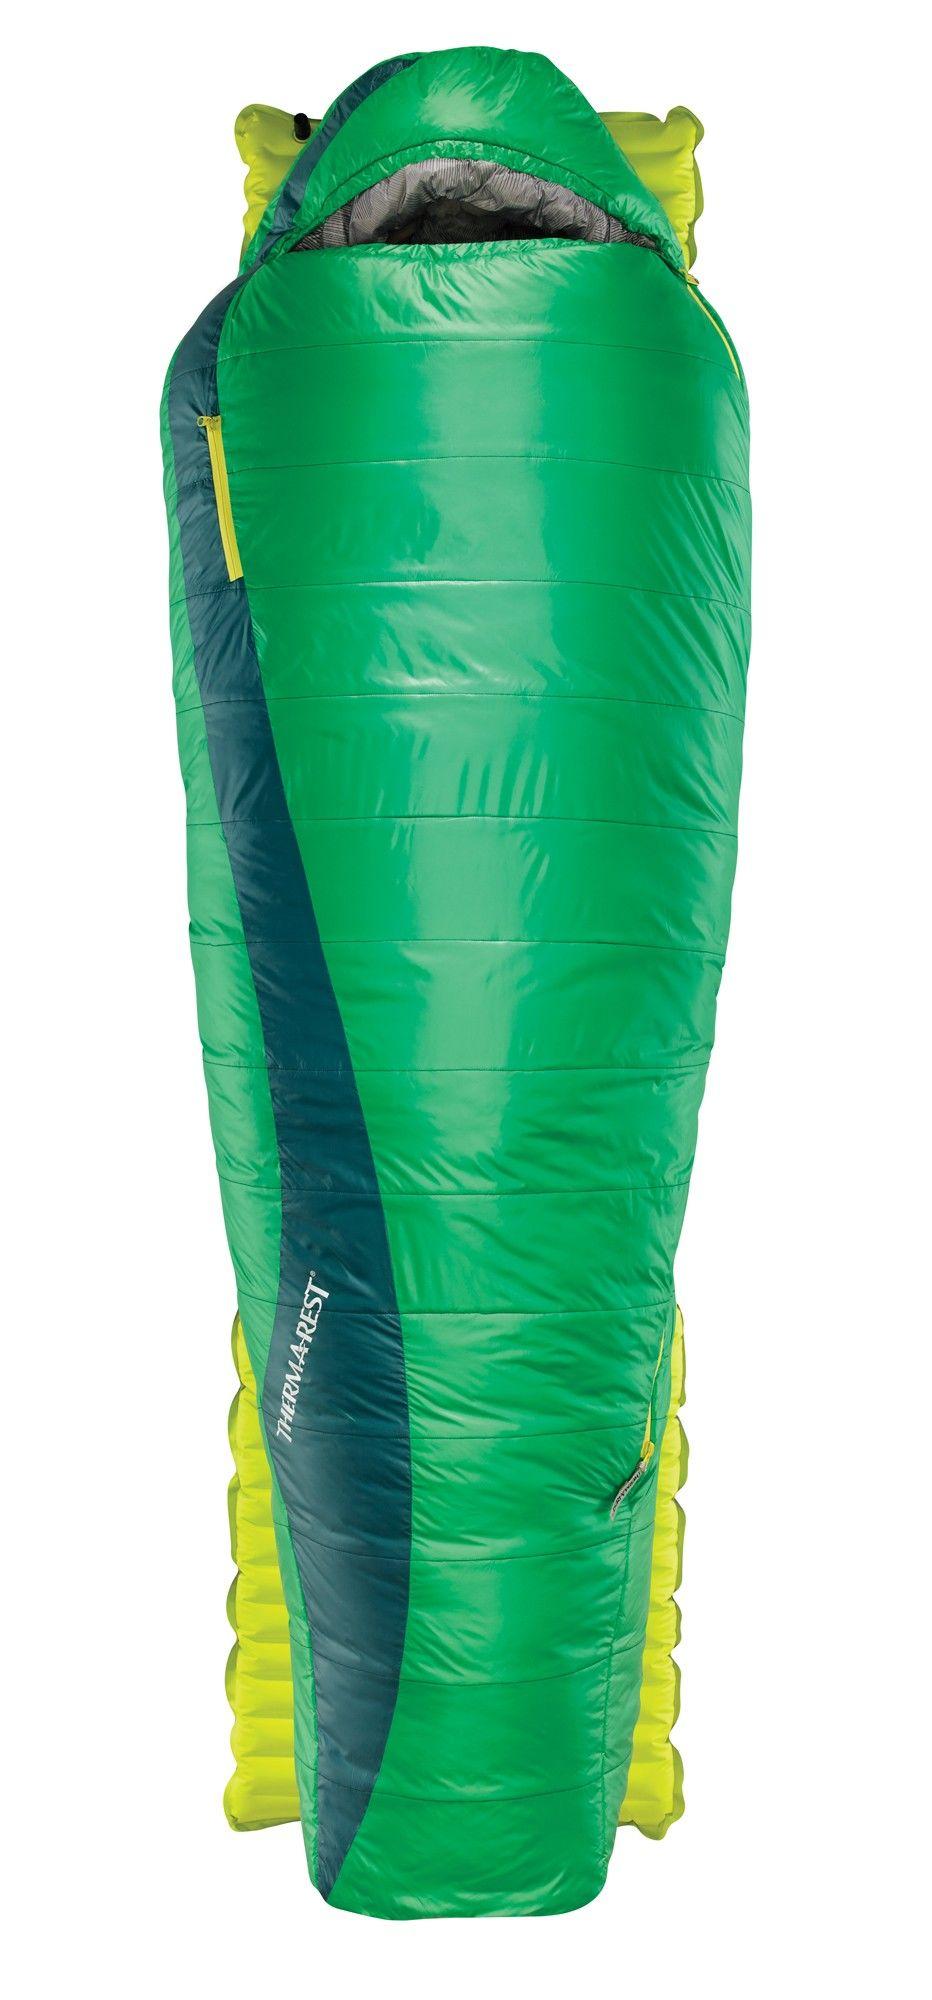 Therm-a-Rest Saros Long | Größe 216 cm - RV links |  Kunstfaserschlafsack